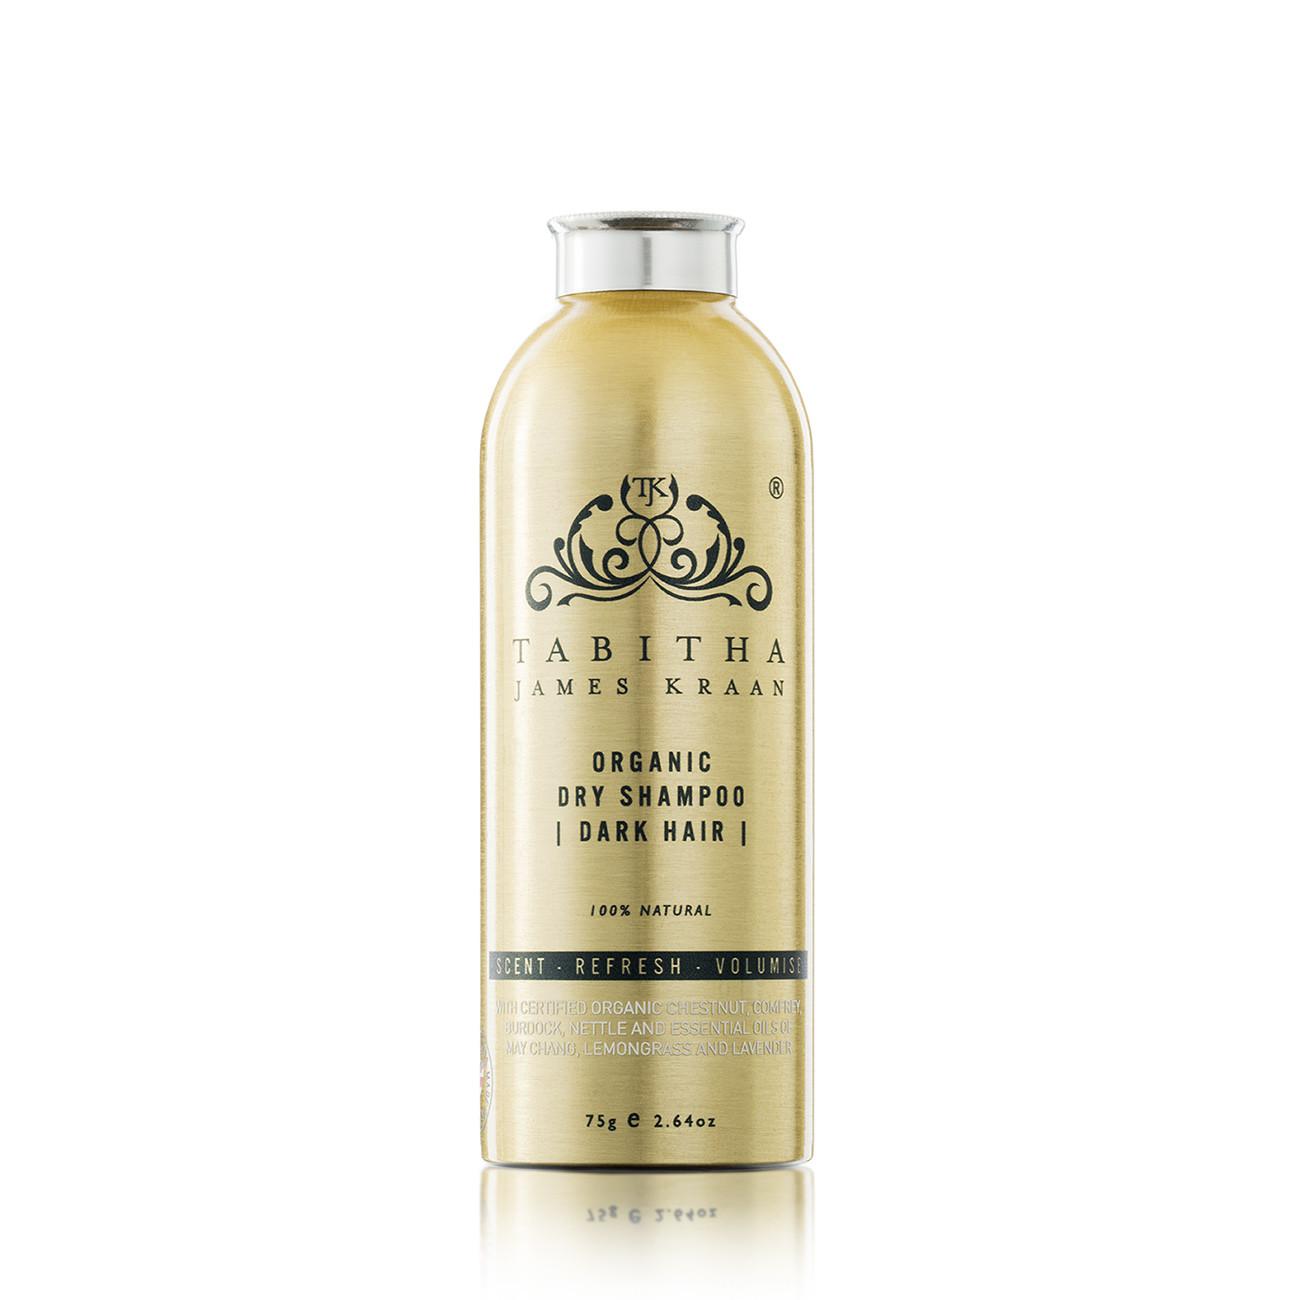 tabithajameskraan-organic-dry-shampoo-dark-hair-75g